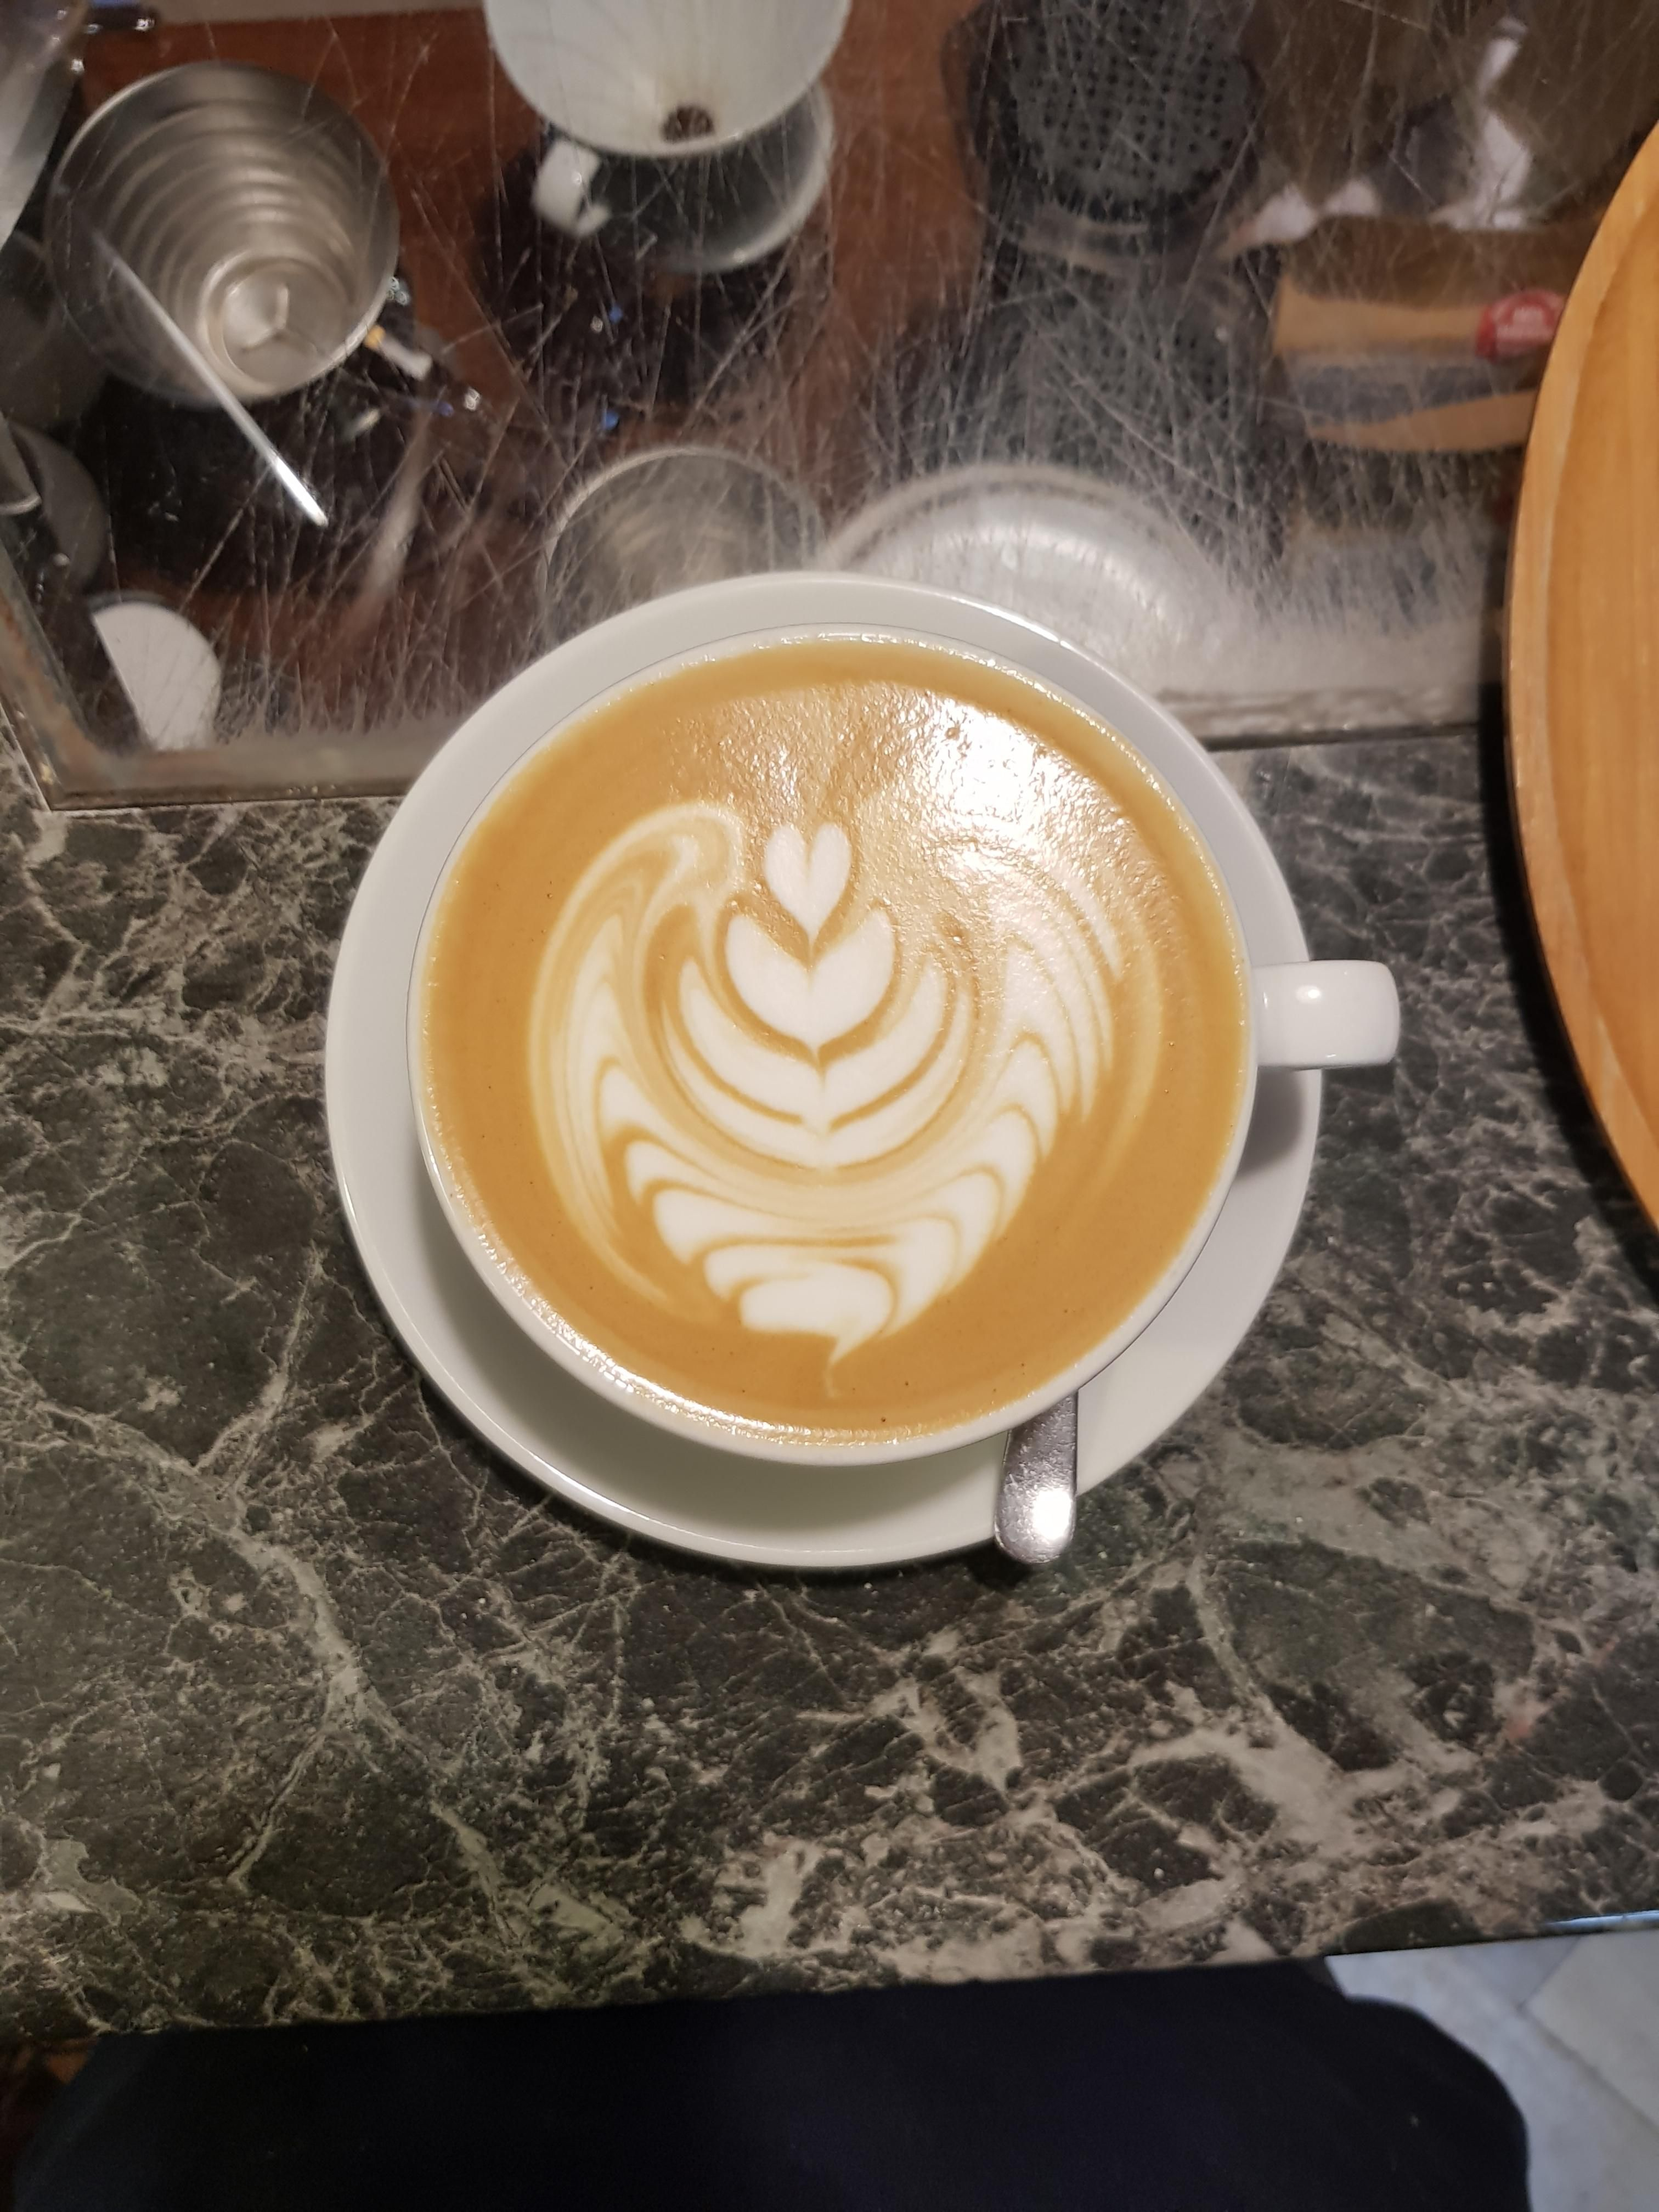 Inverted Rosetta With 4 Layer Tulip Coffee Cafe Espresso Photography Coffeeaddict Yummy Barista Coffee Latte Art Coffee Preparation Cappuccino Machine